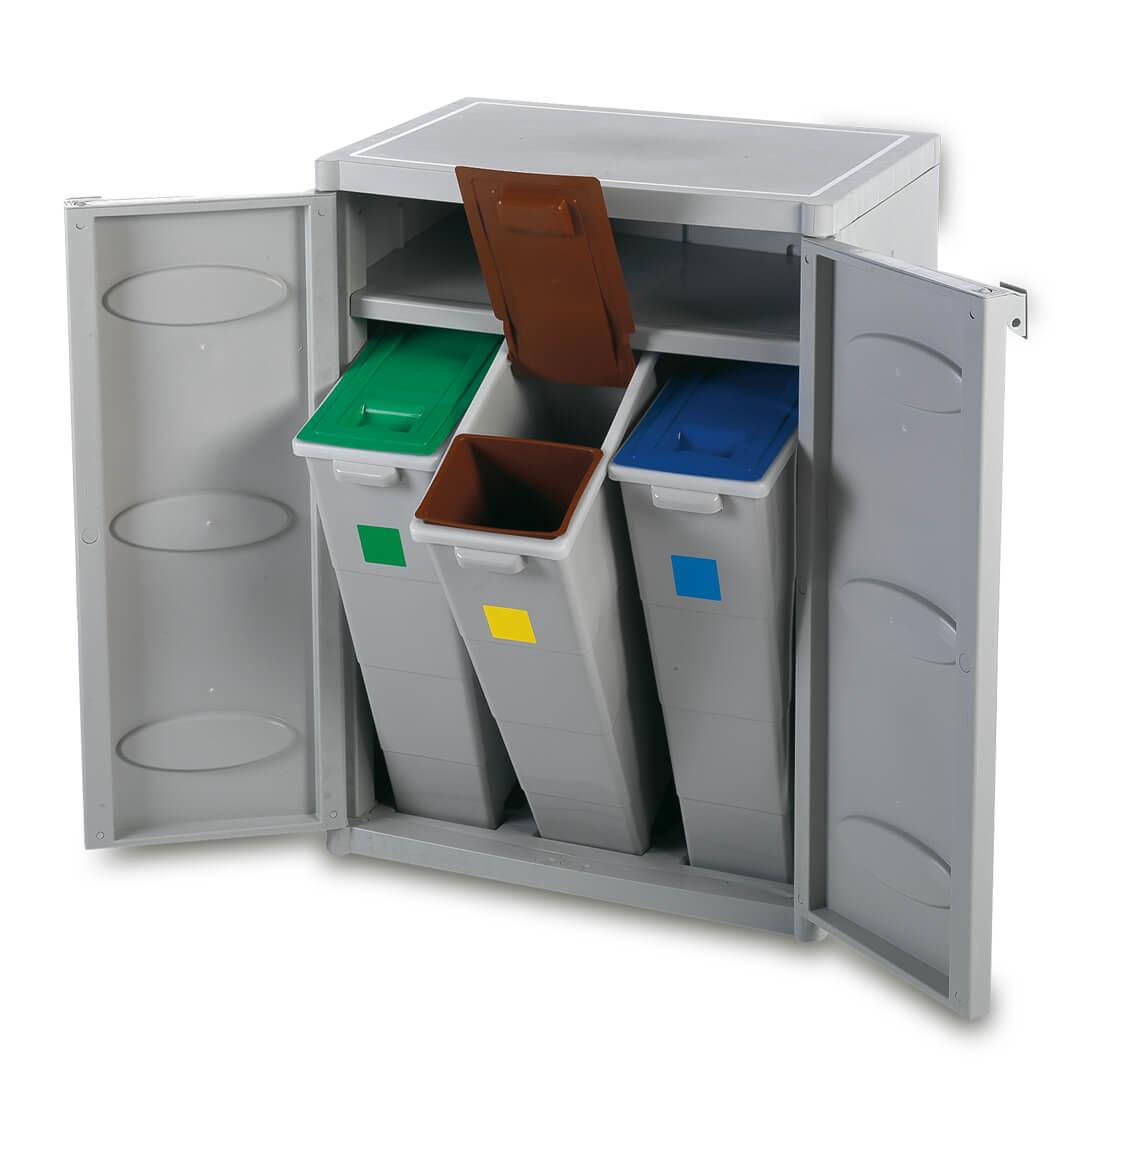 System d gensiniplast - Mobiletto raccolta differenziata ...